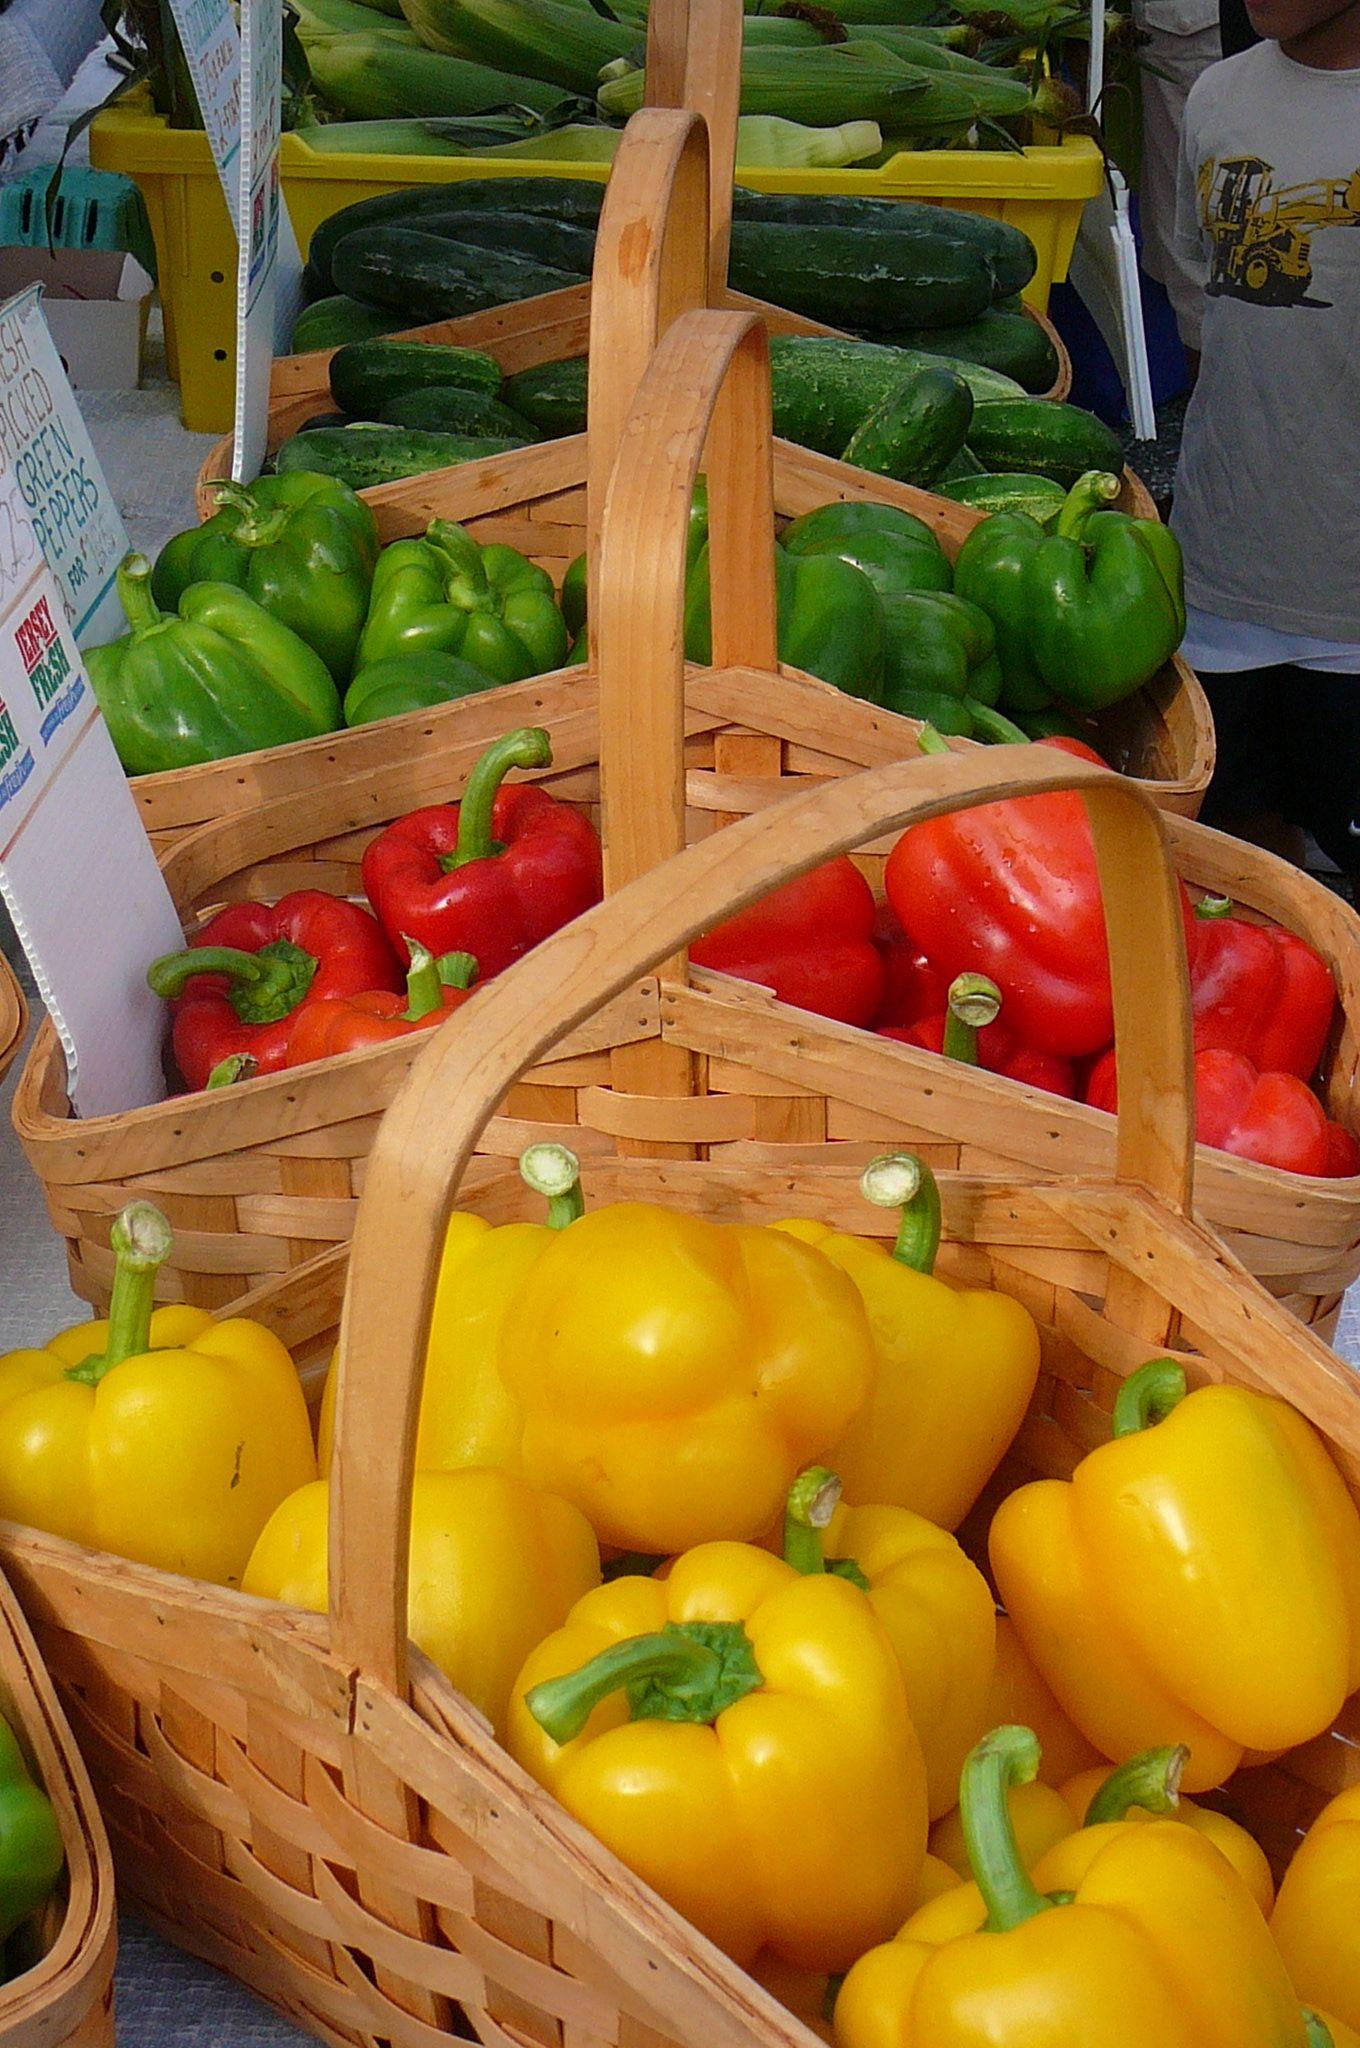 Ocean City Farmer's Market features farmfresh fruits